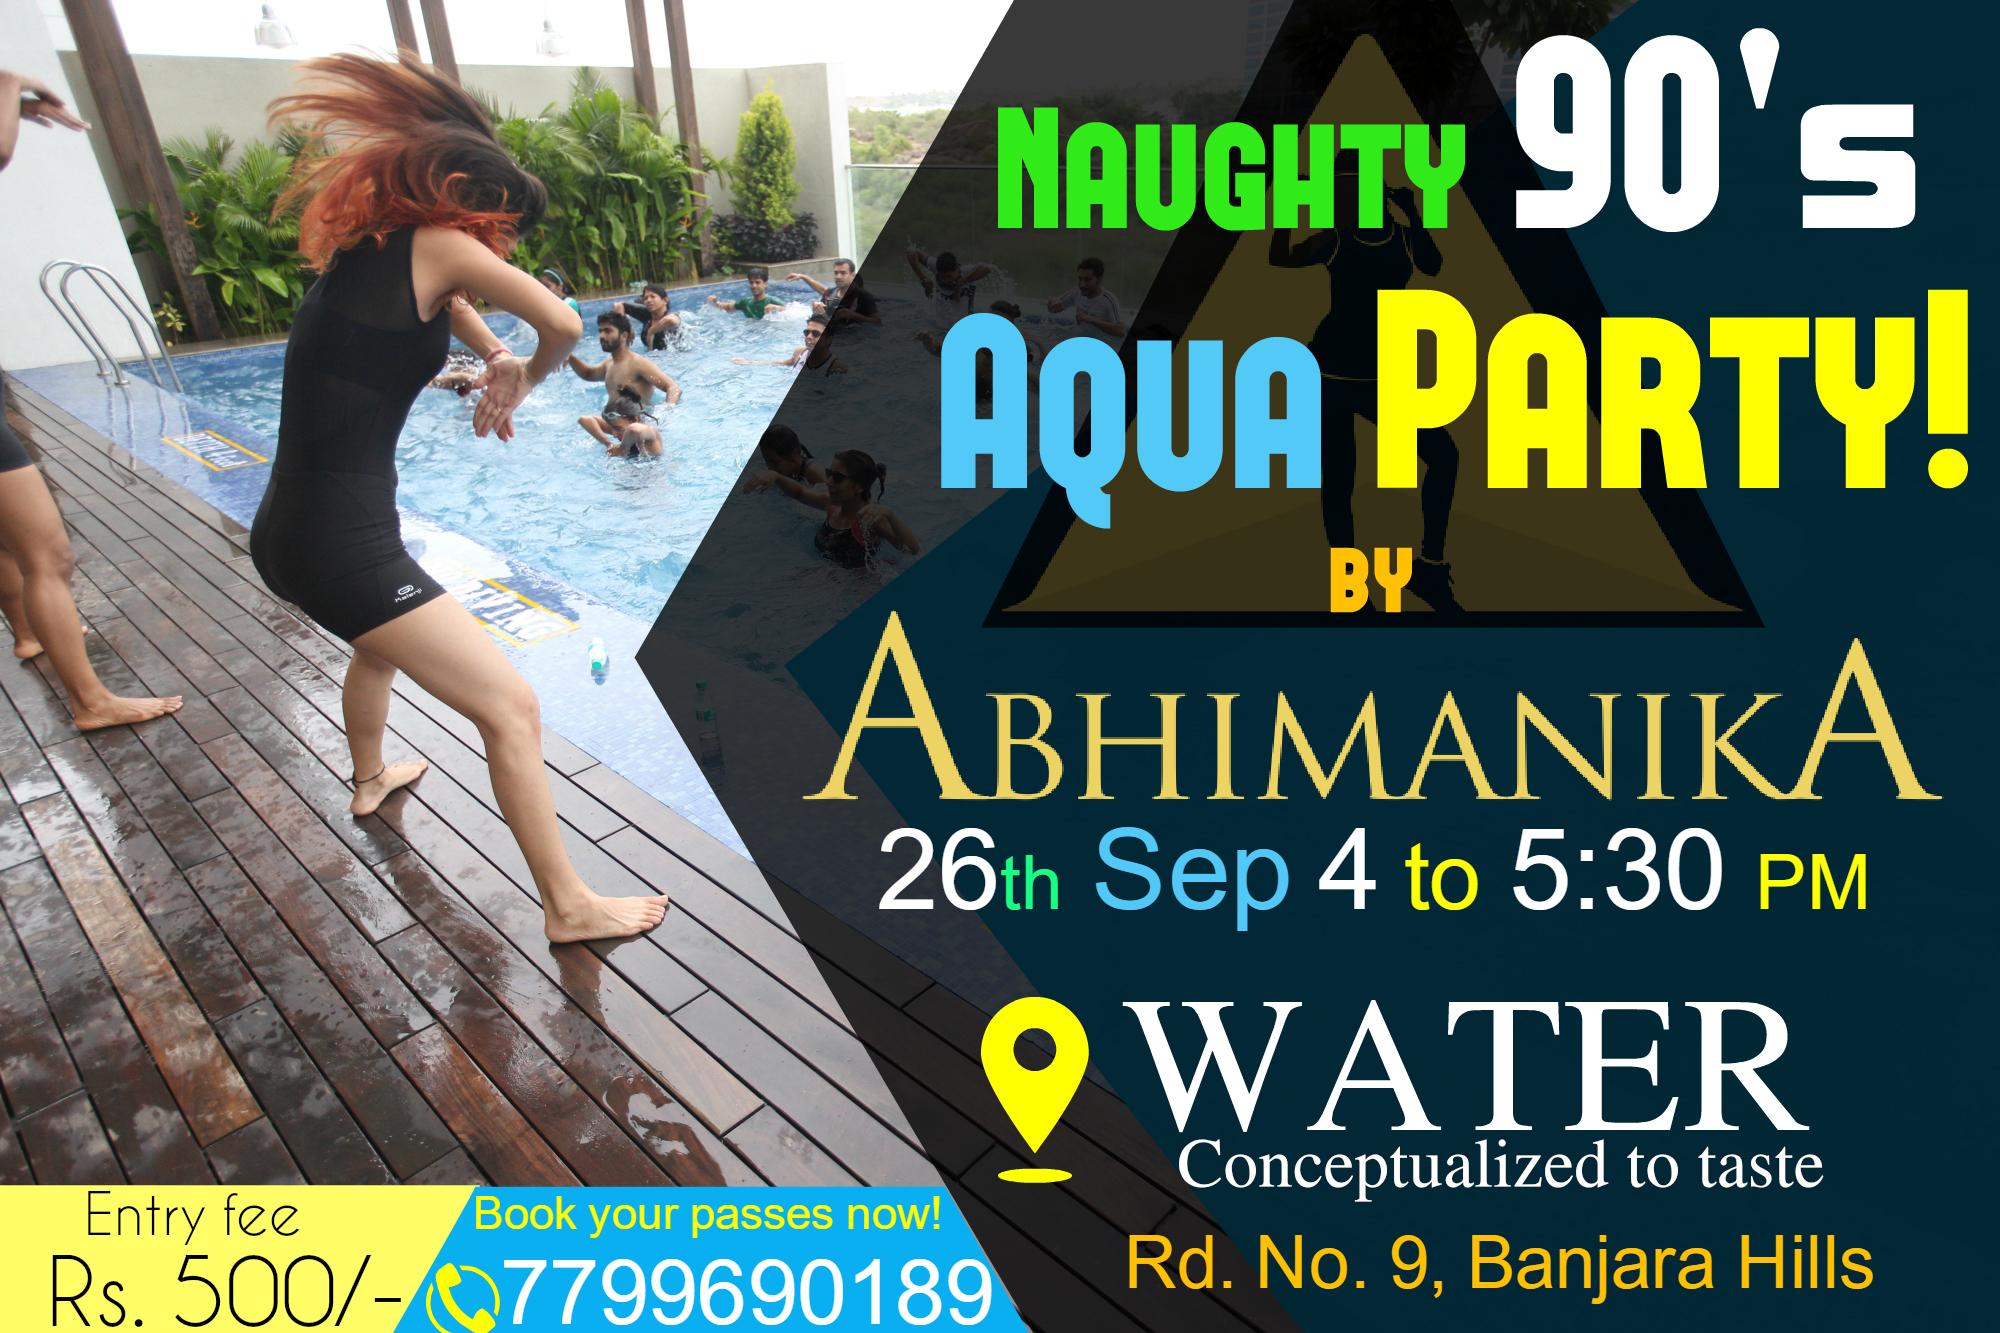 Naughty 90s Aqua Dance Party With Abhimanika